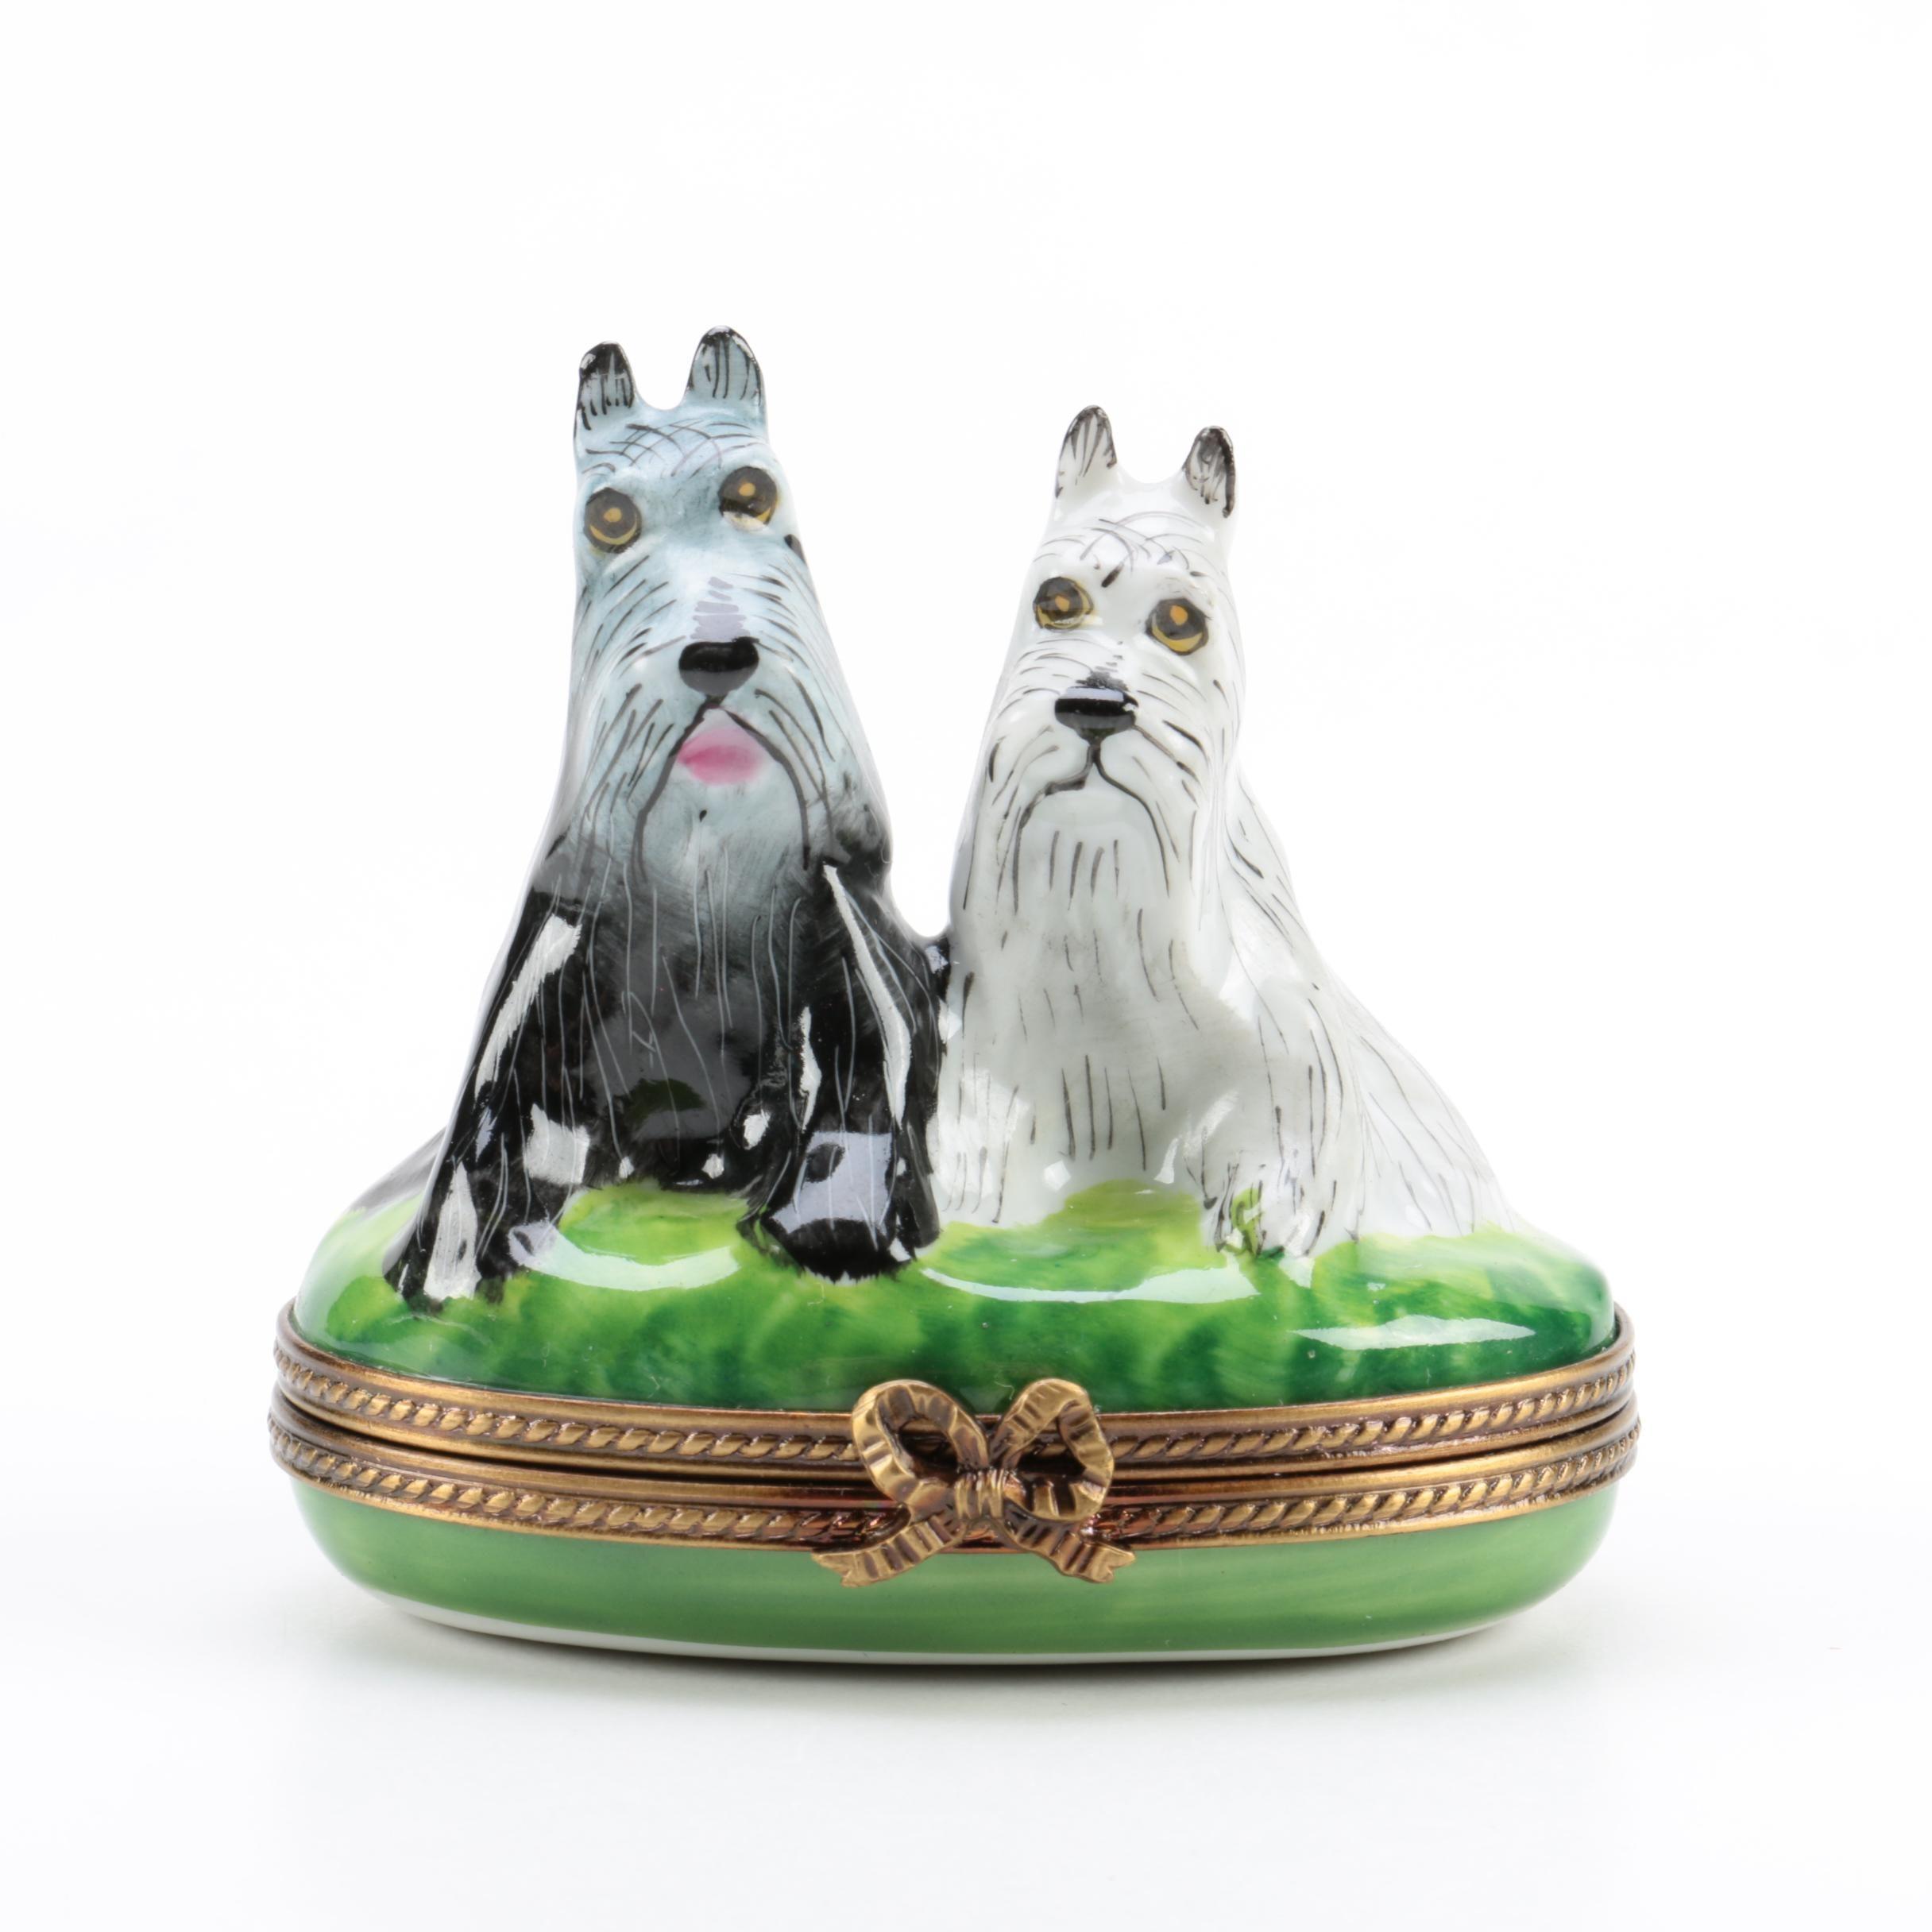 Hand Painted Limoges Porcelain Terrier Trinket Box